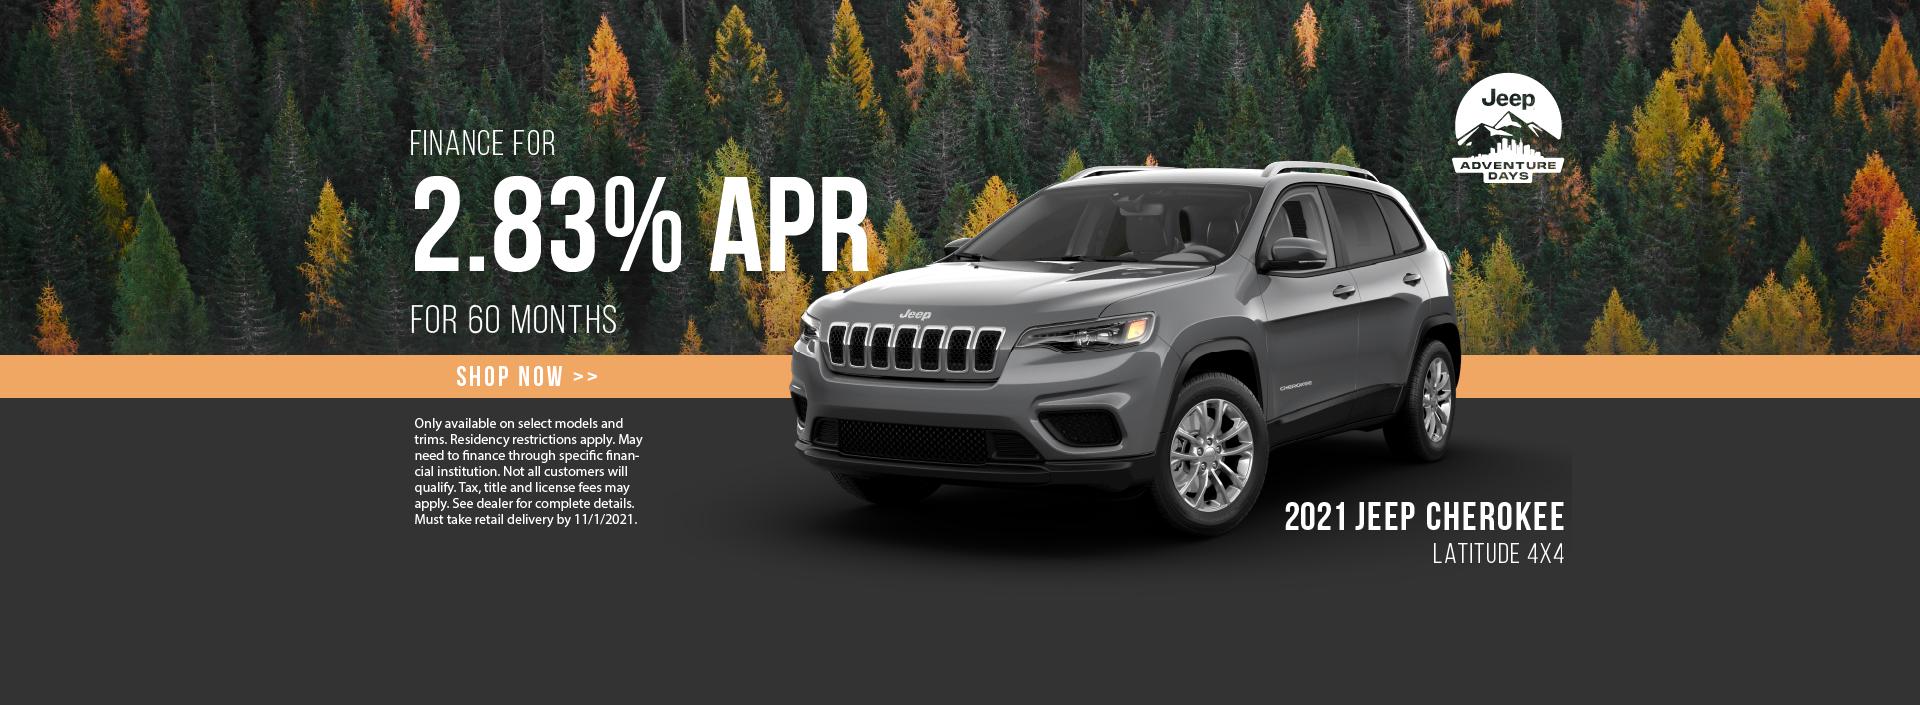 2021 Jeep Cherokee Finance Offer